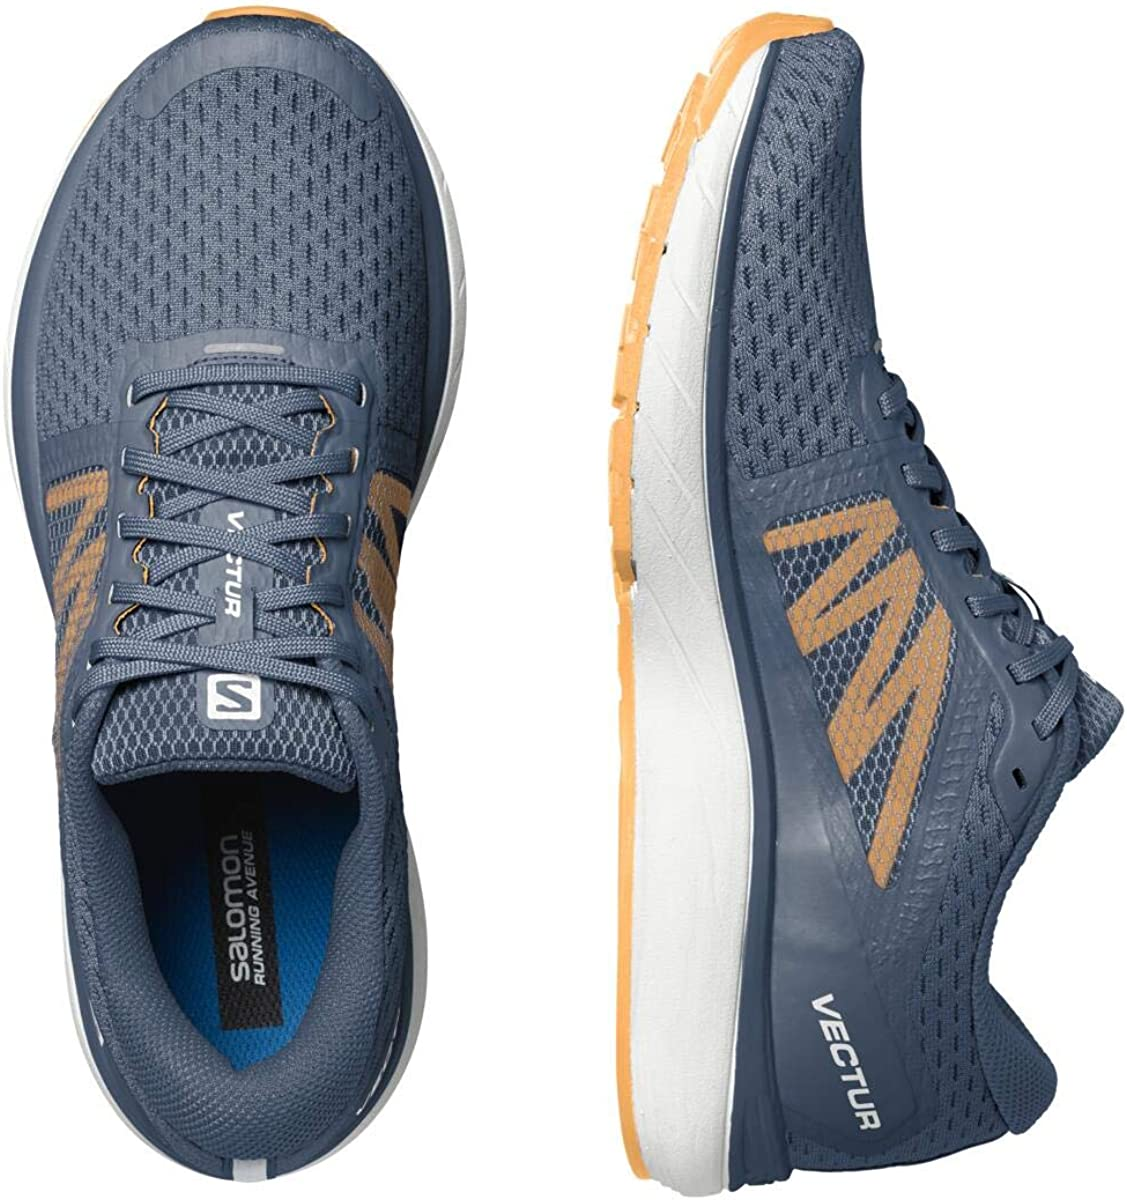 Salomon Mens VECTUR Road Running Shoe Dark Denim//White//Warm Apricot